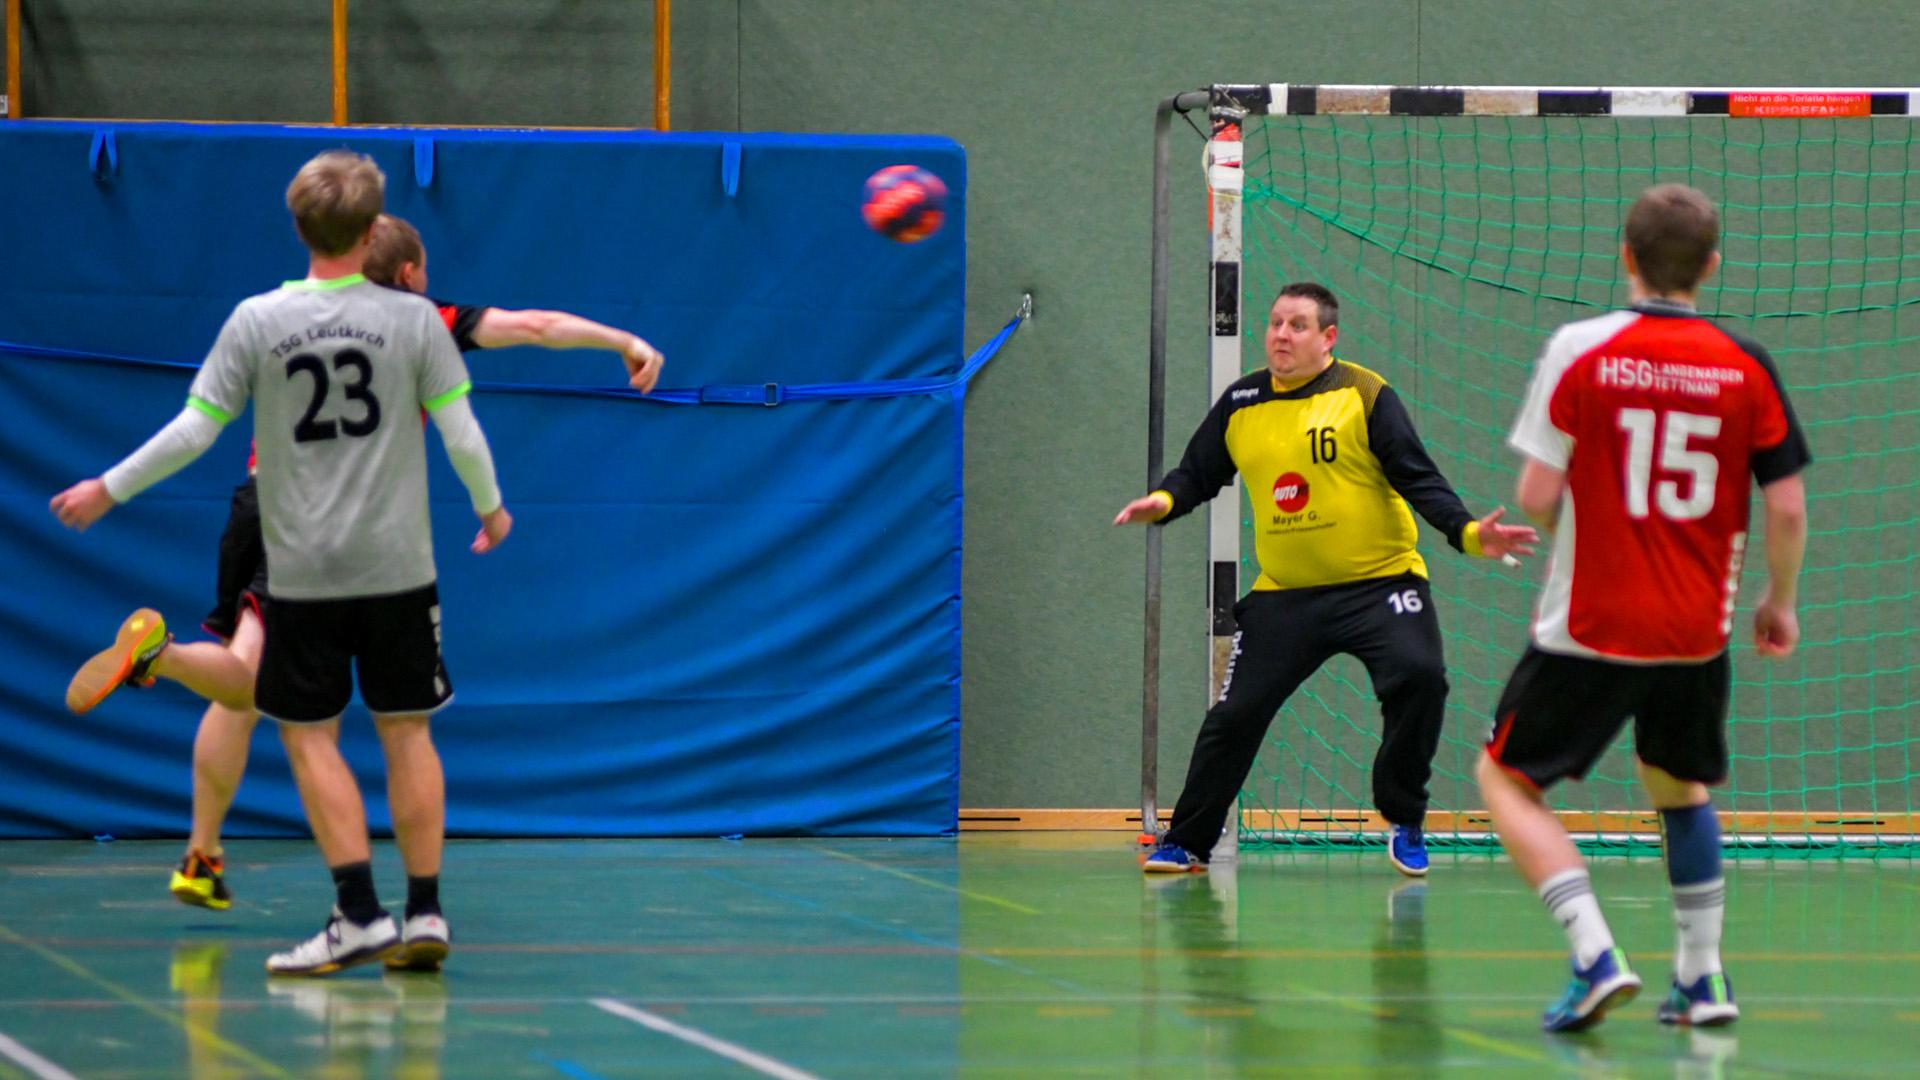 075Slider_Herren2_tsg_leutkirch_handball